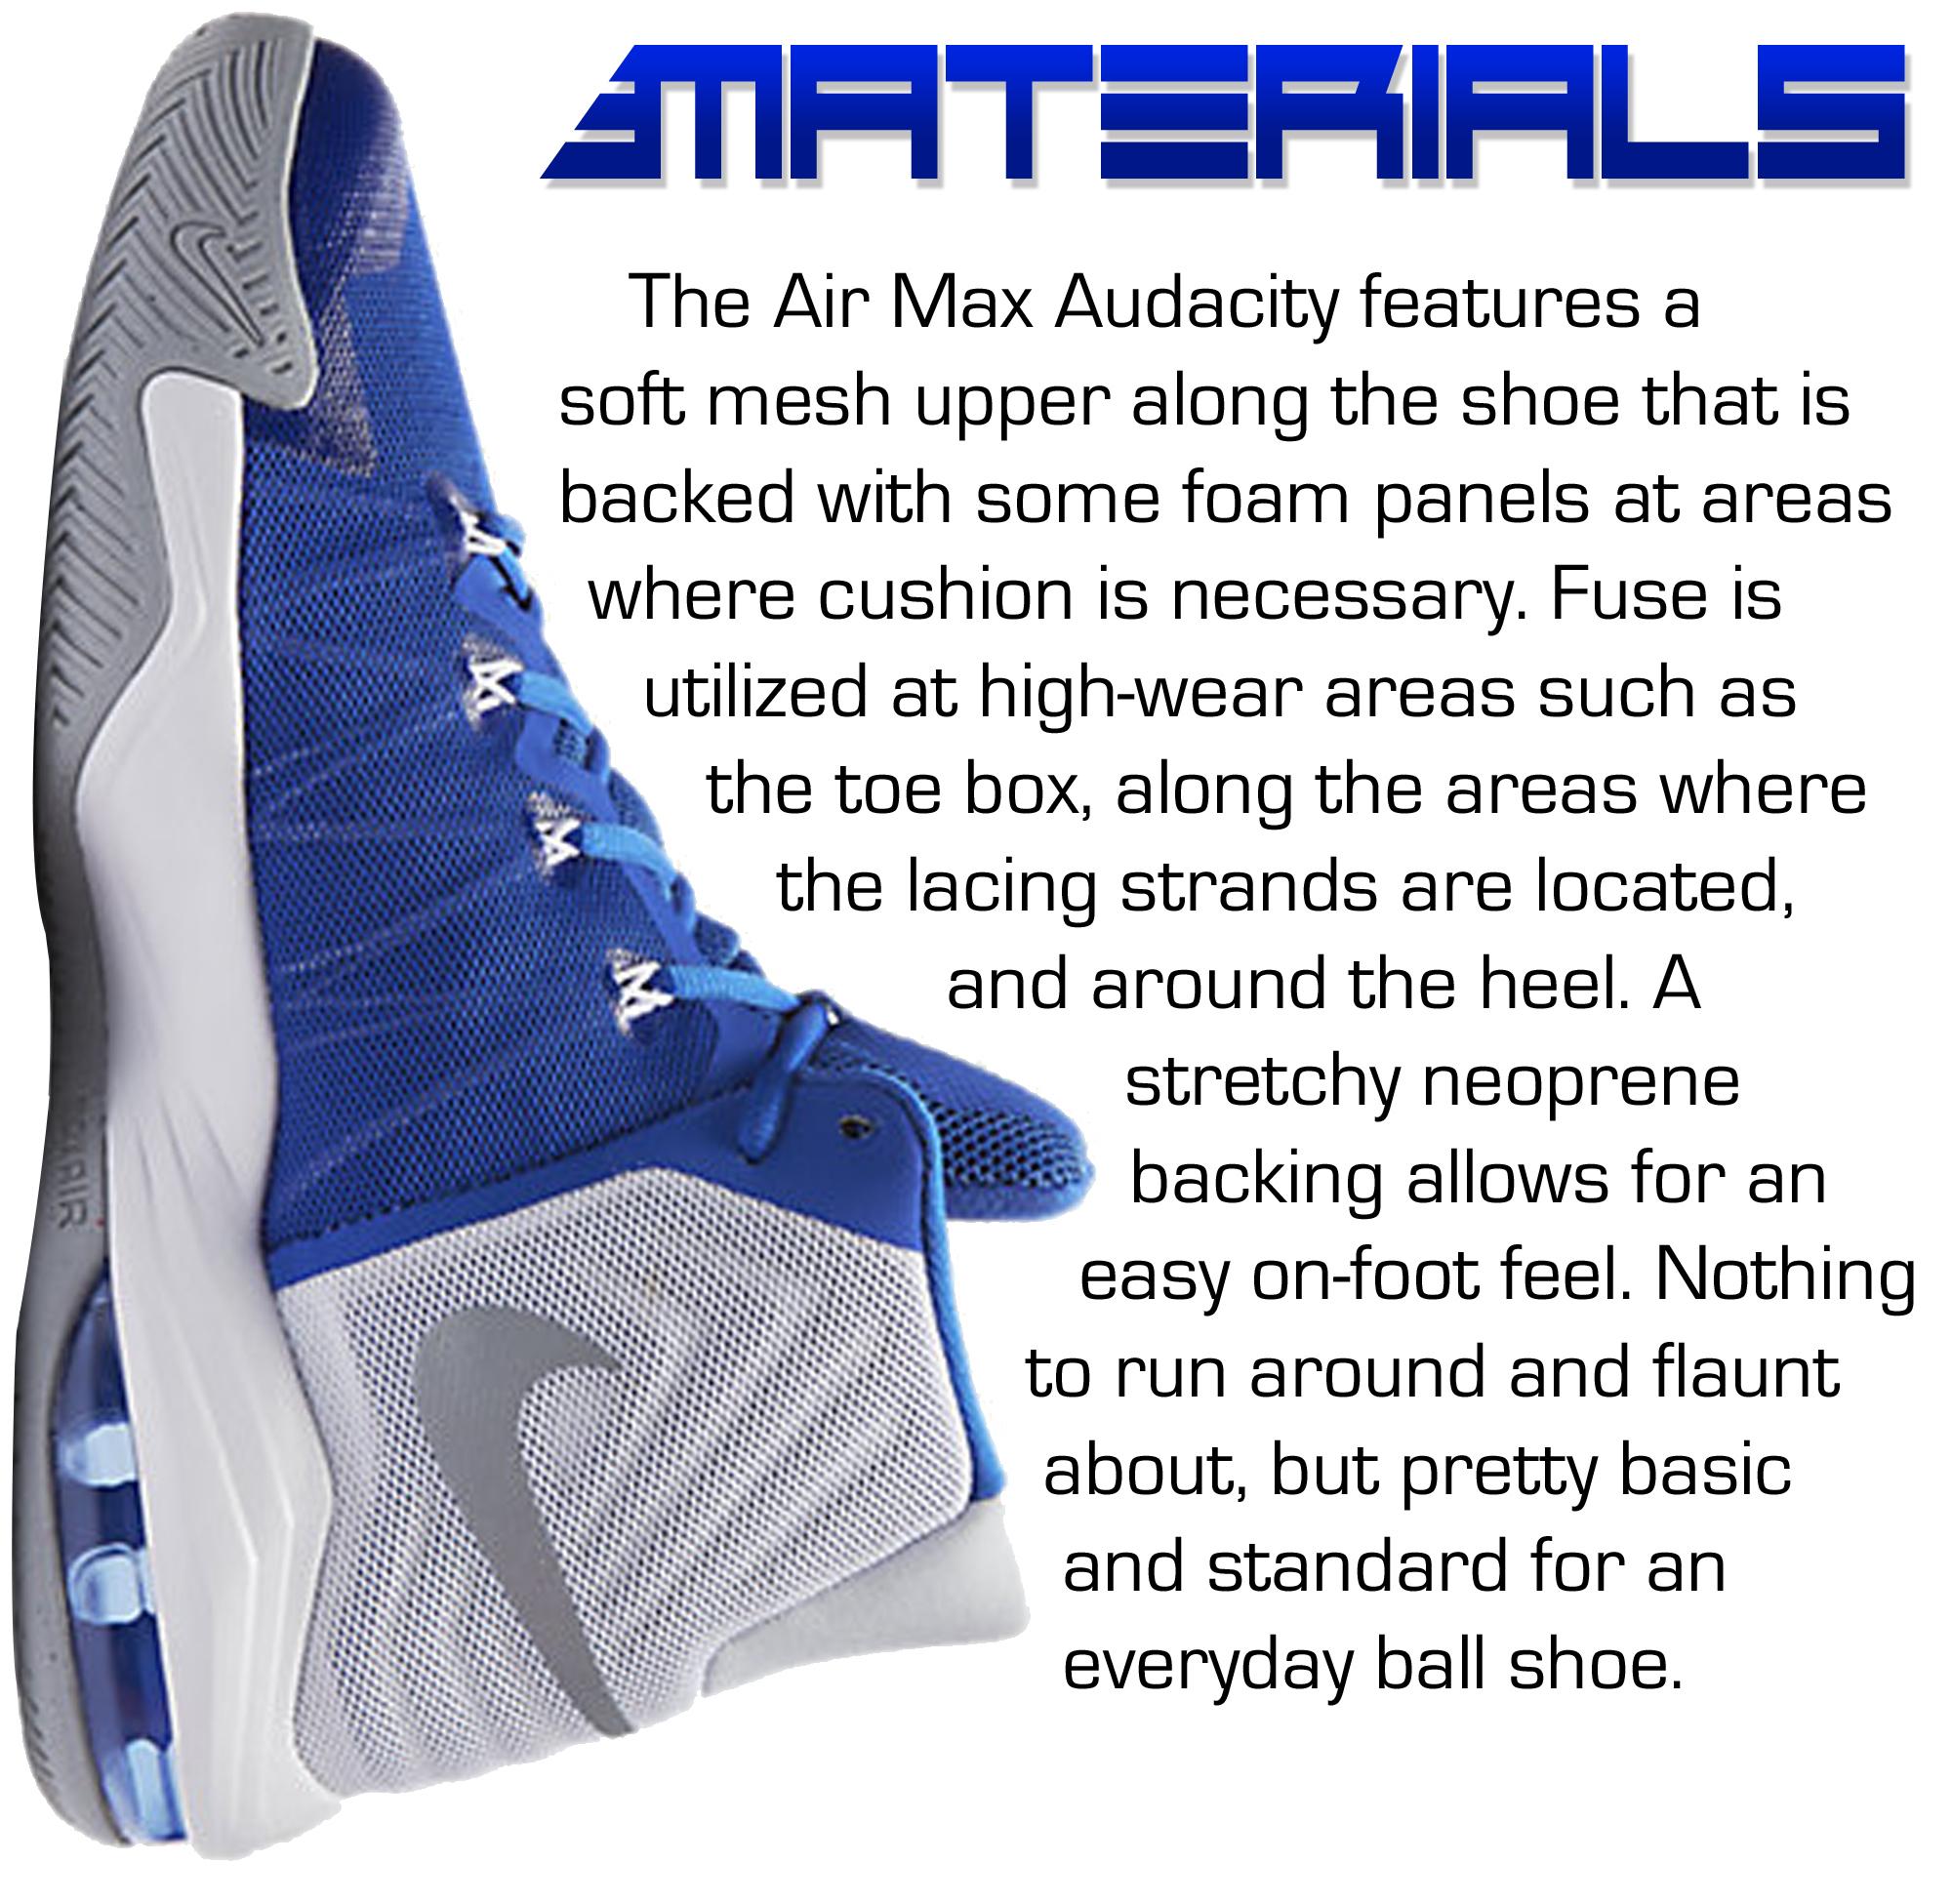 Nike Air Max Audacity - Materials